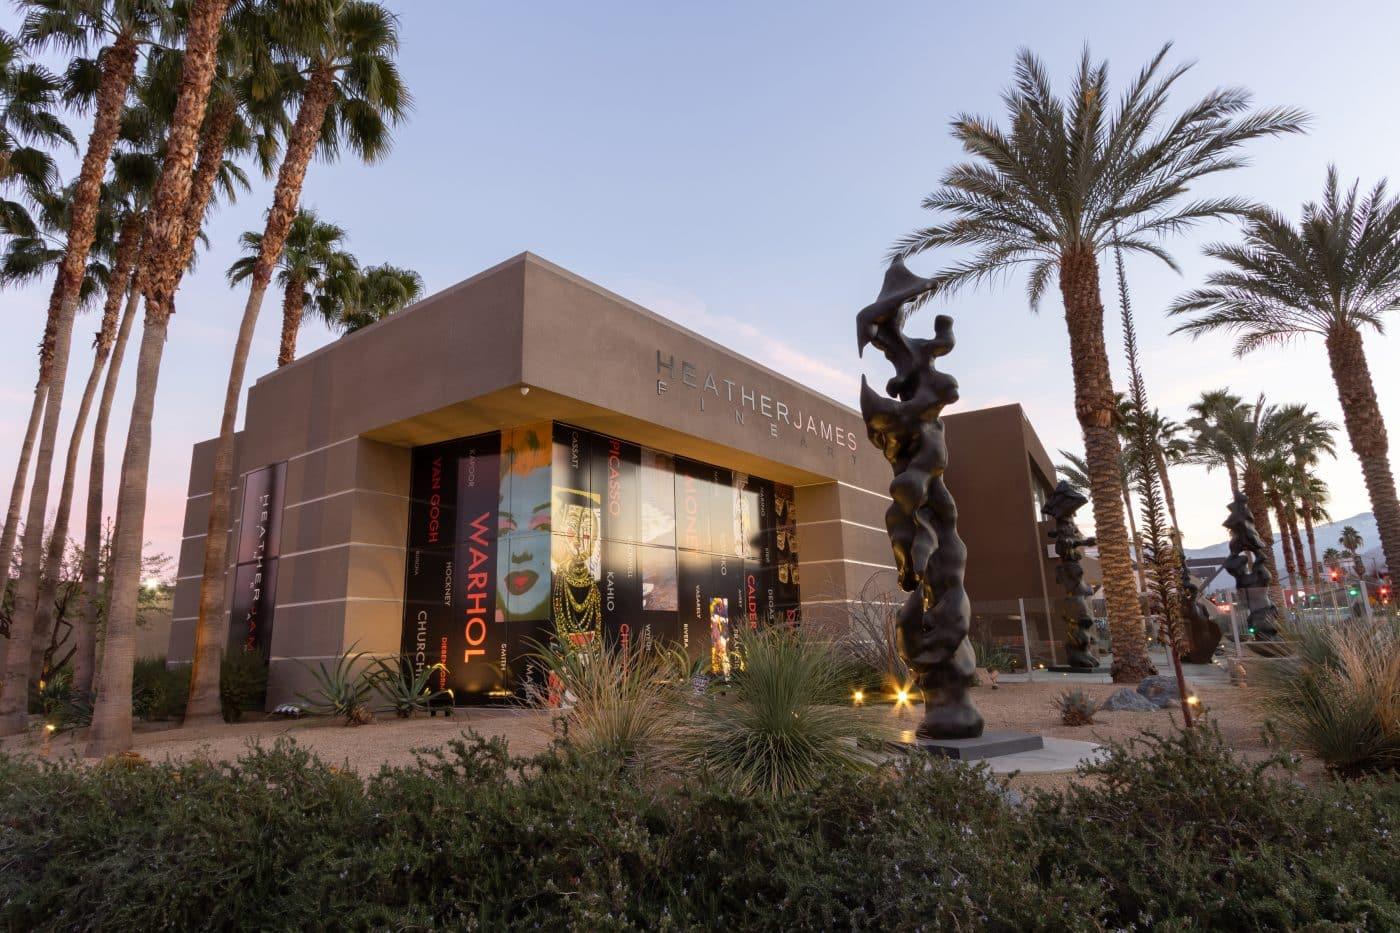 The Palm Desert, California, location of Heather James Fine Art